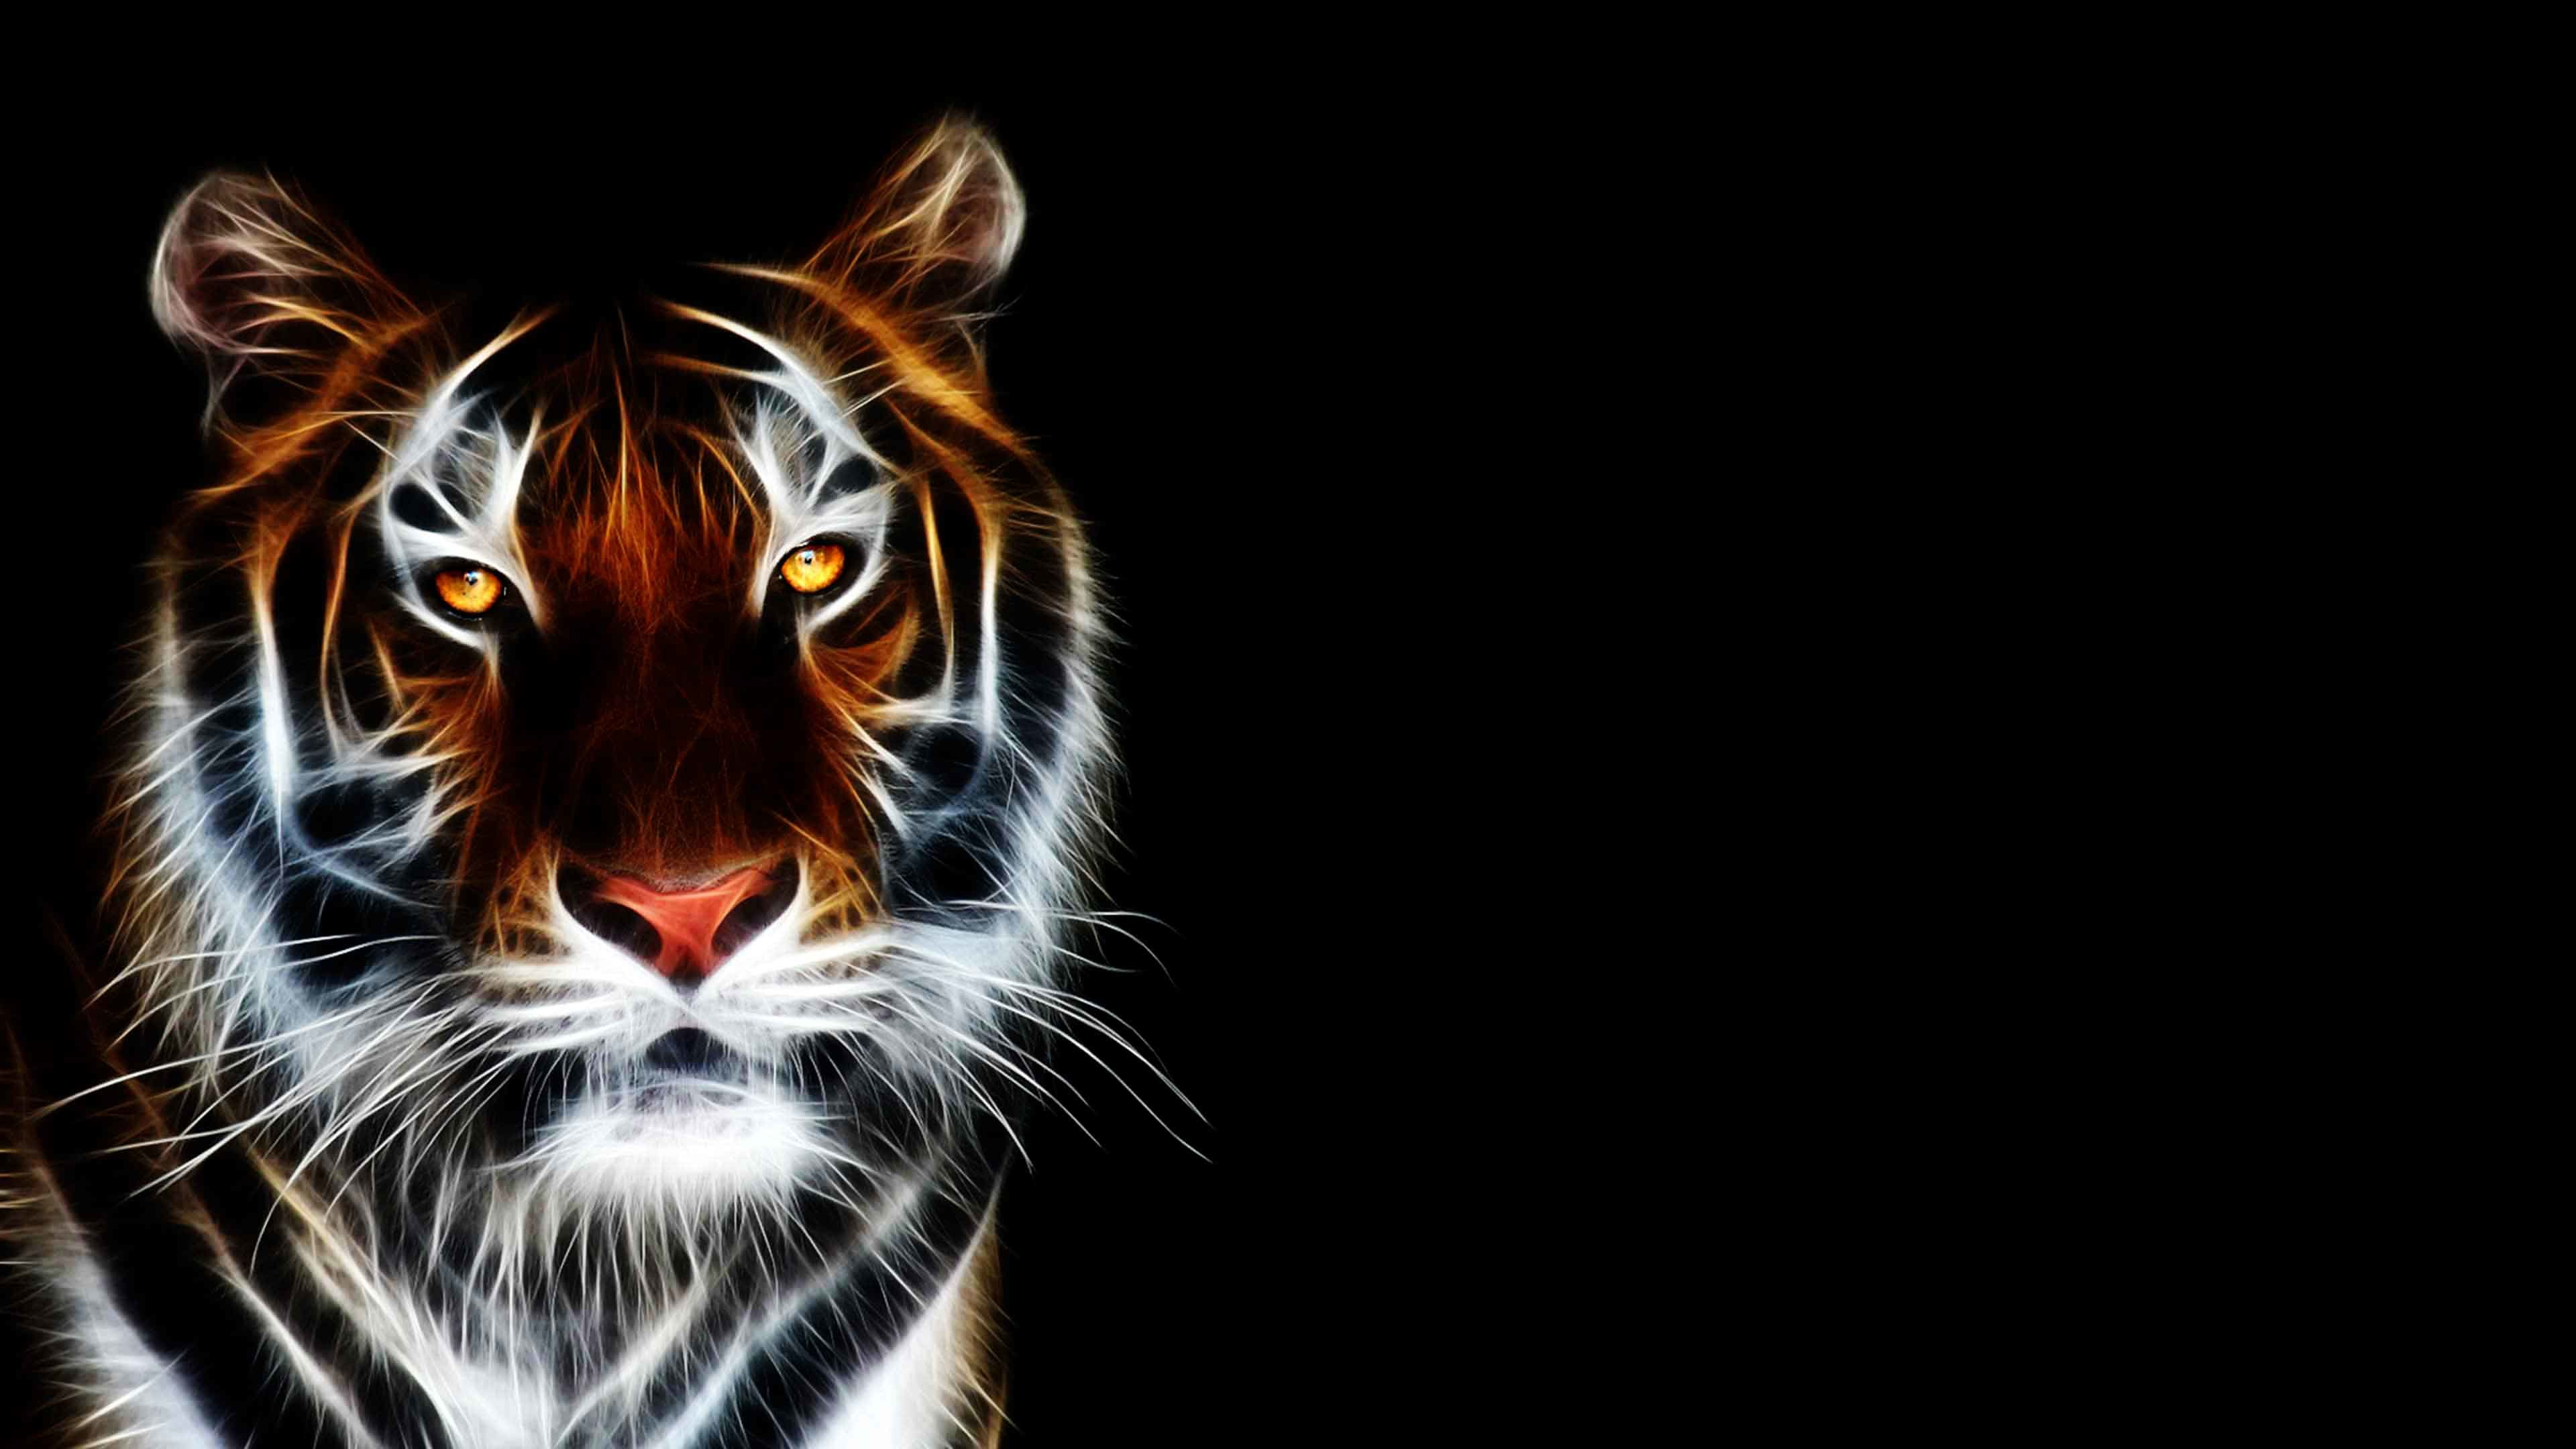 3D Animated Tiger Wallpaper